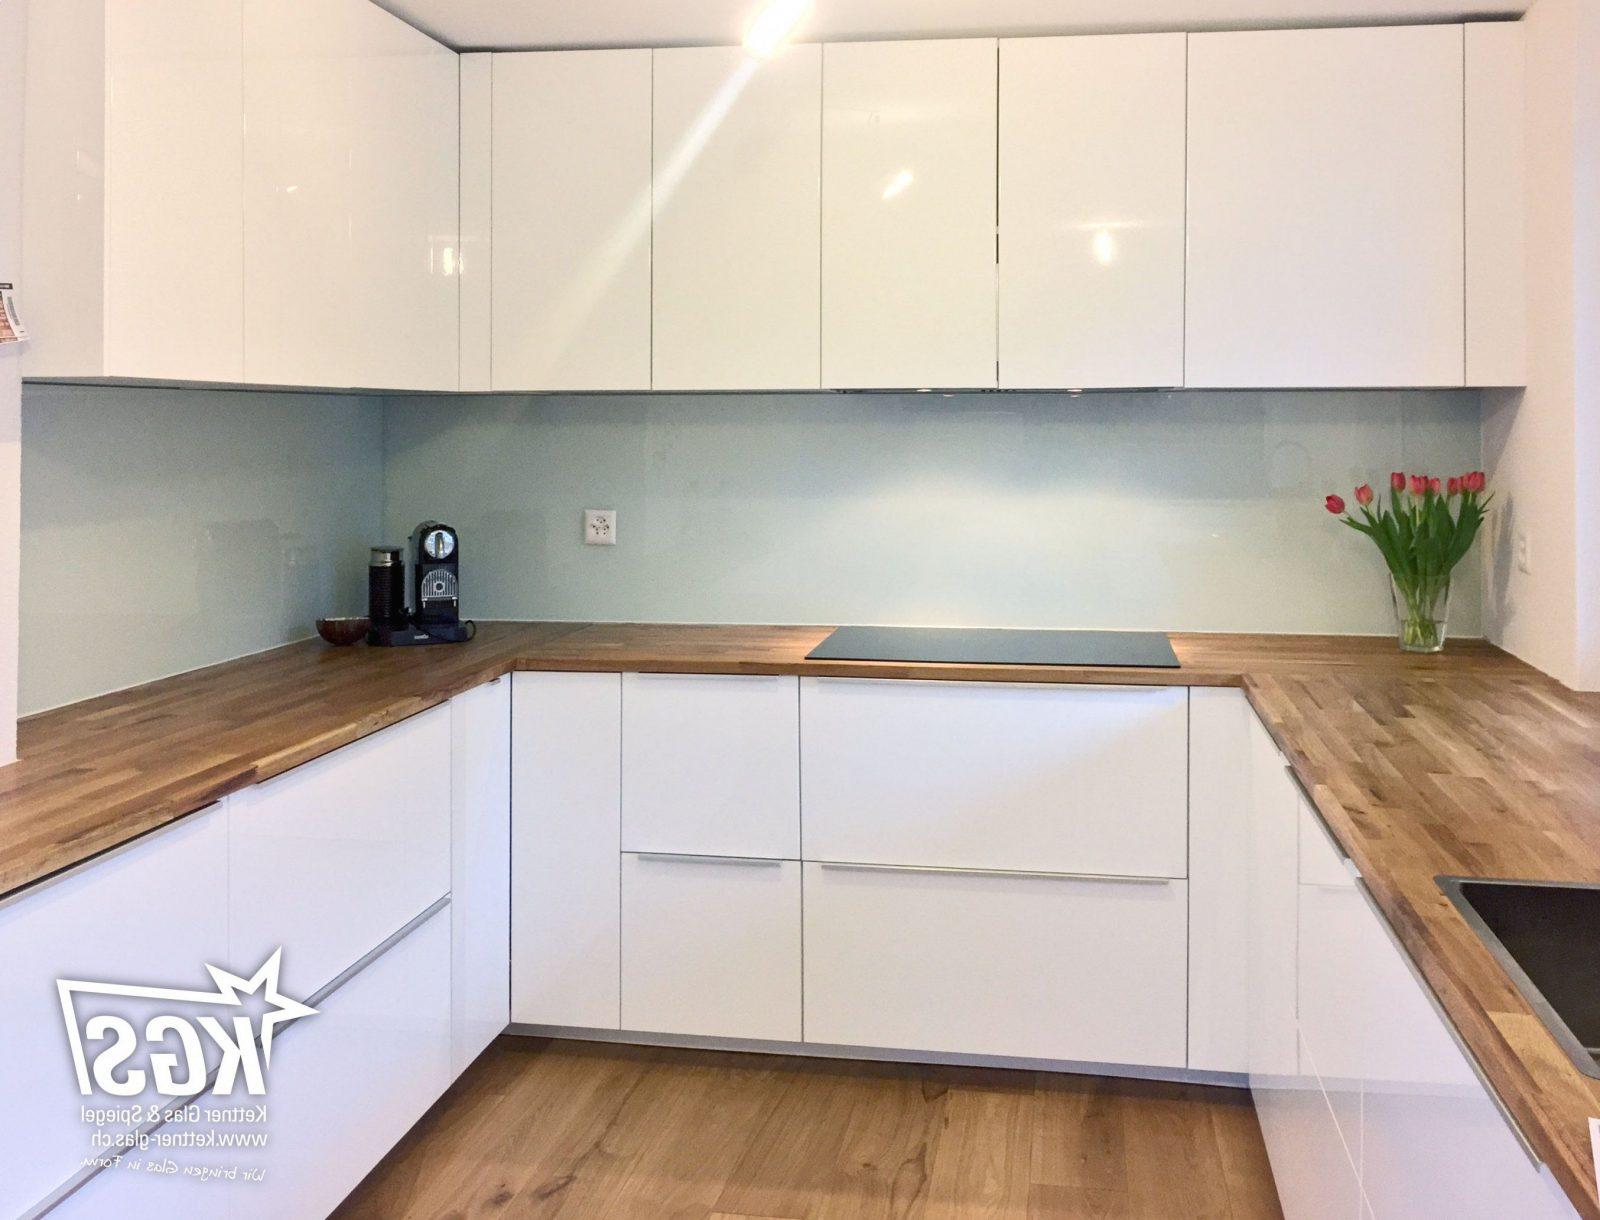 Rückwand Küche Plexiglas | Rückwand Küche Kunststoff Einzig 20 Top ...